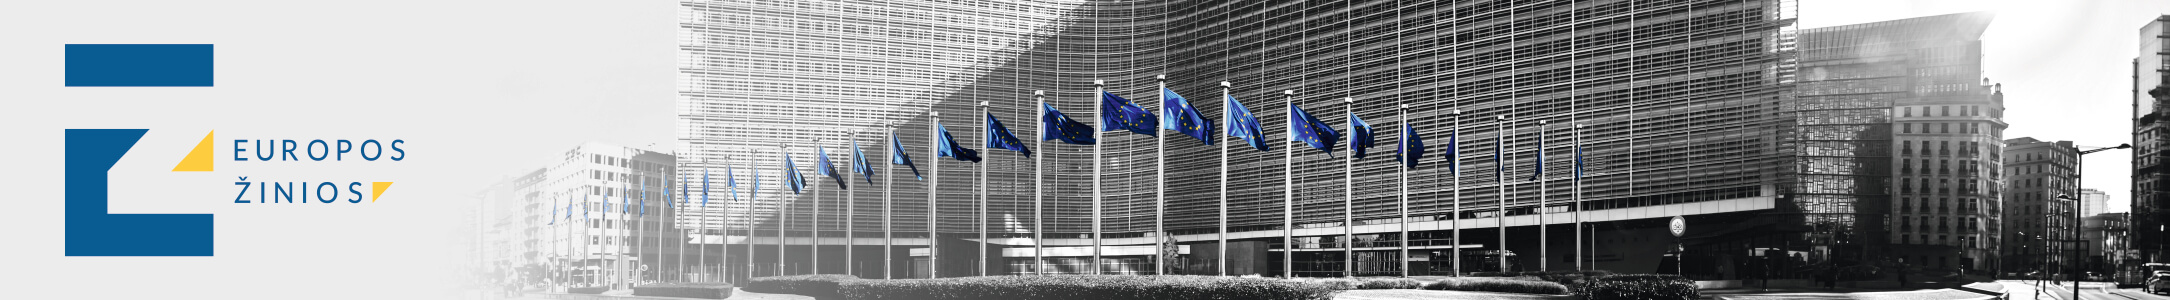 Europos žinios